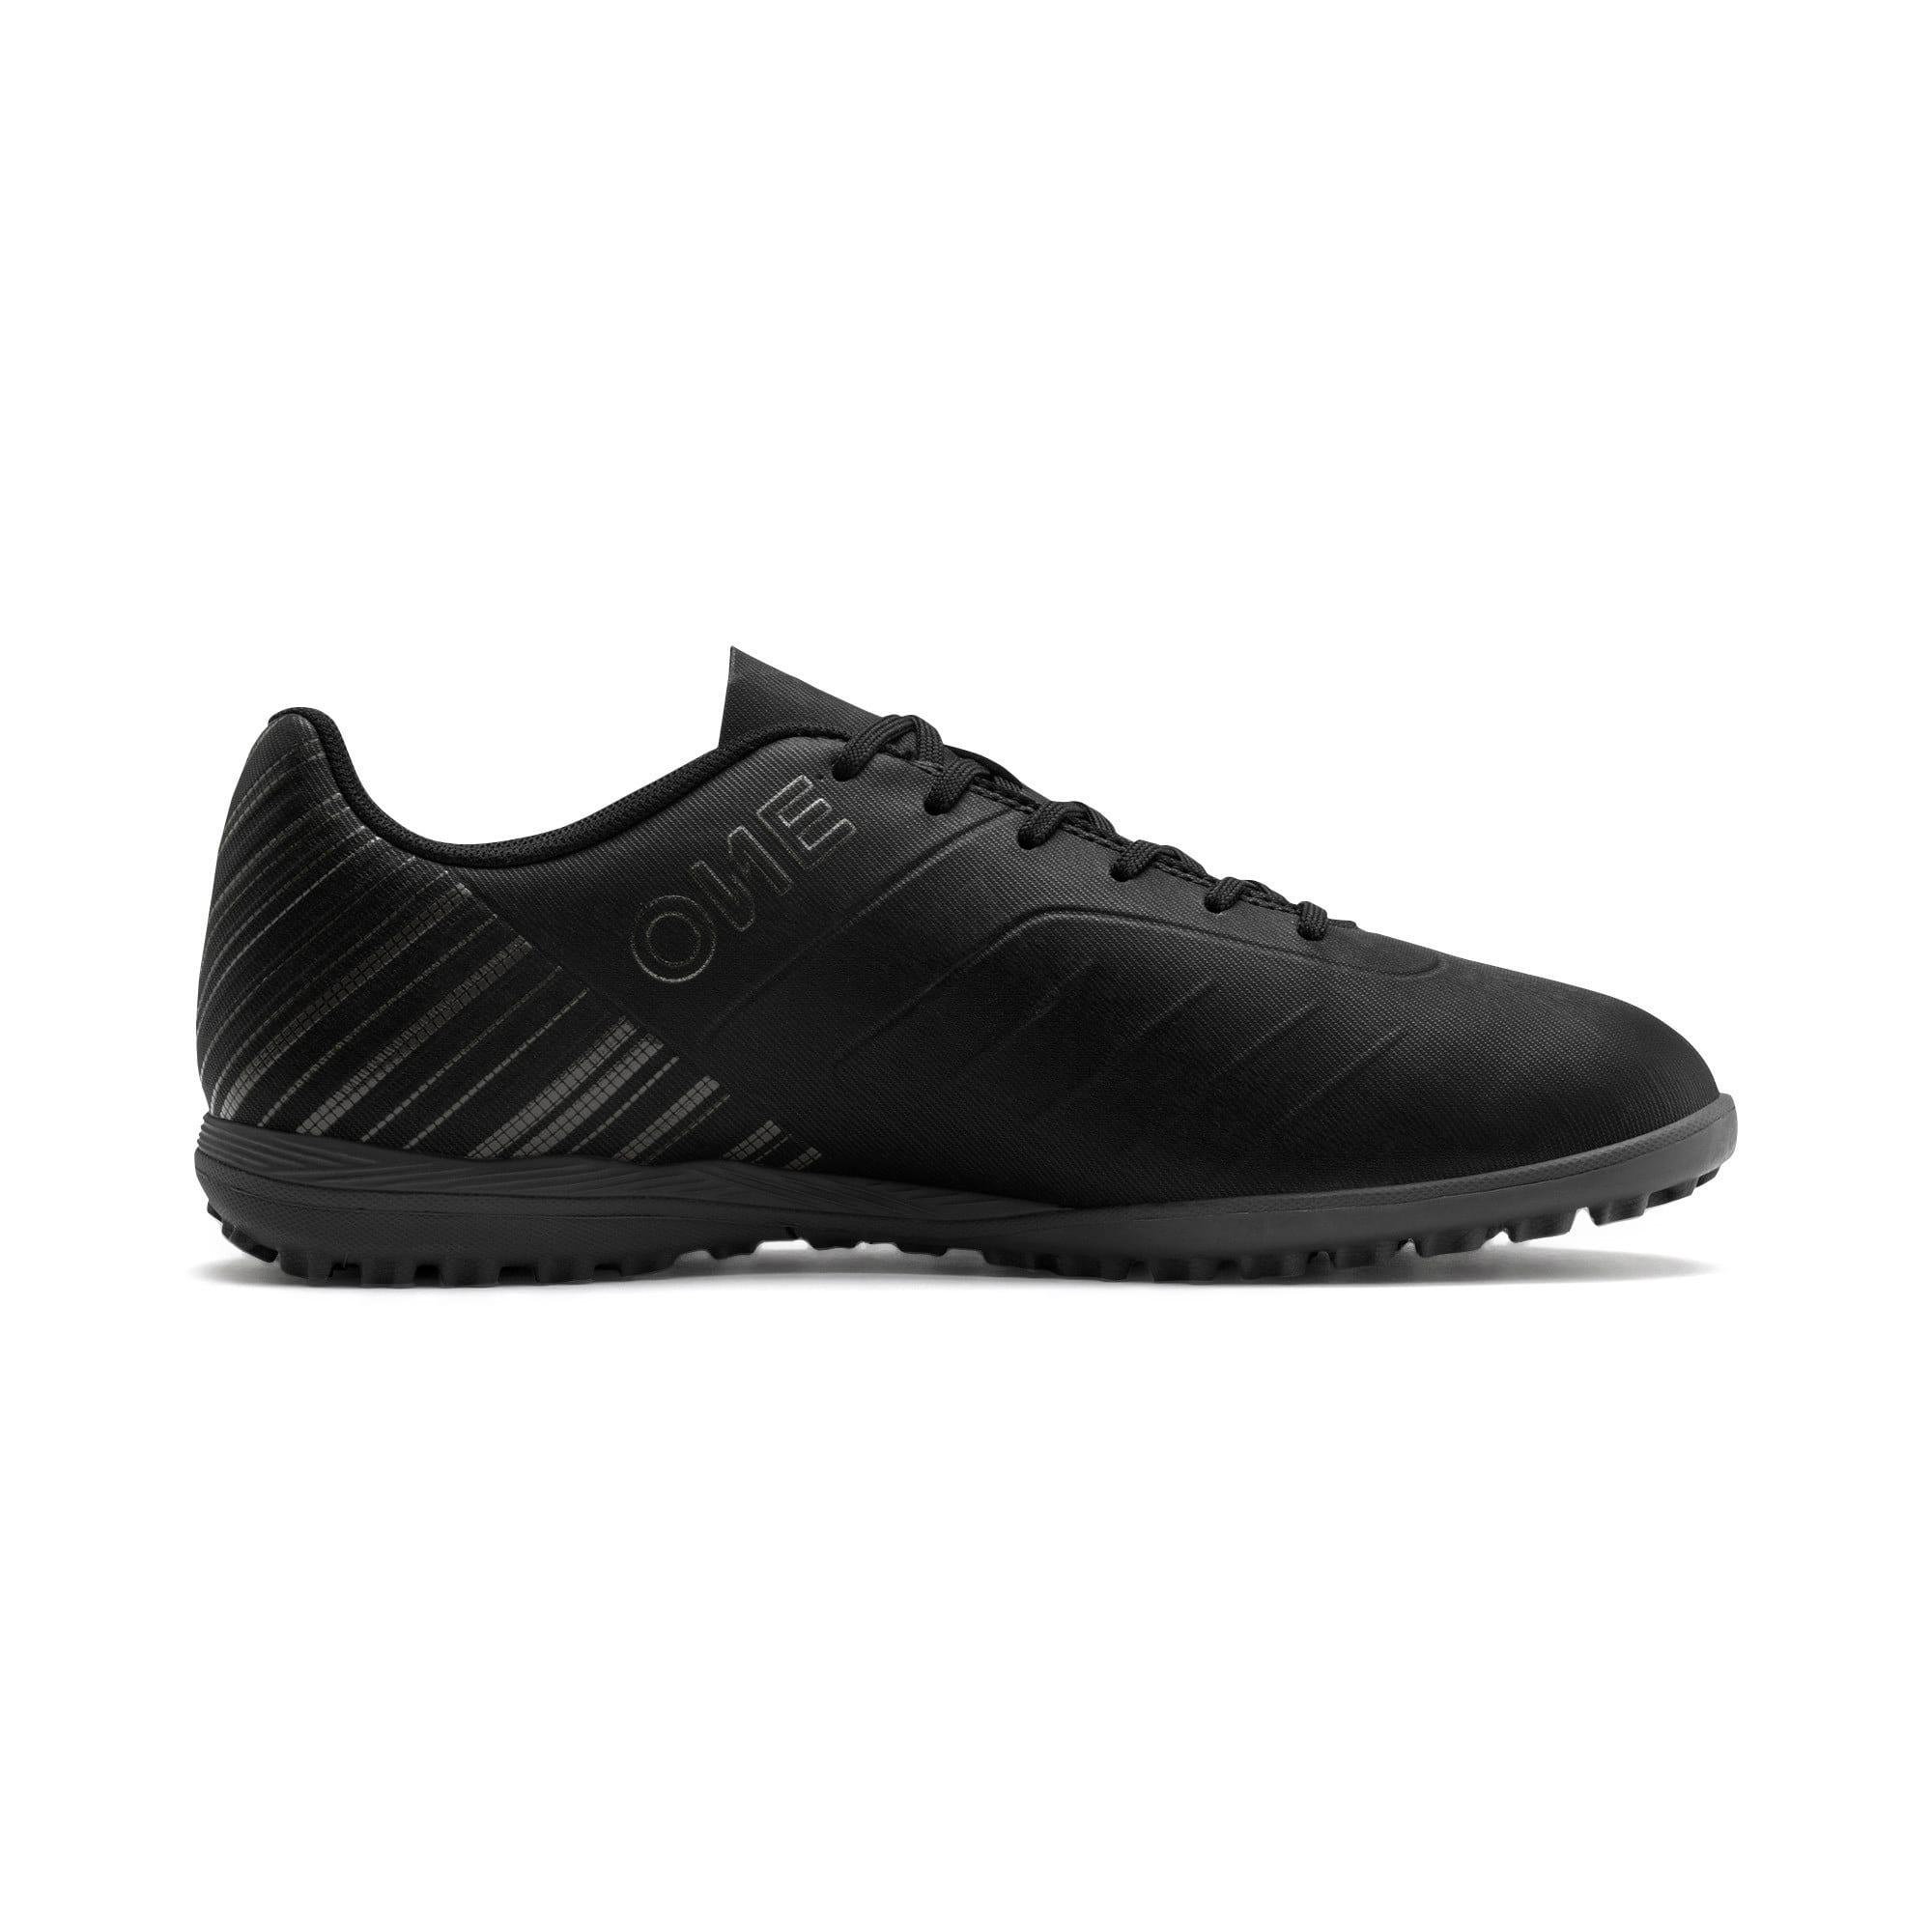 Thumbnail 6 of PUMA ONE 5.4 TT Men's Soccer Shoes, Black-Black-Puma Aged Silver, medium